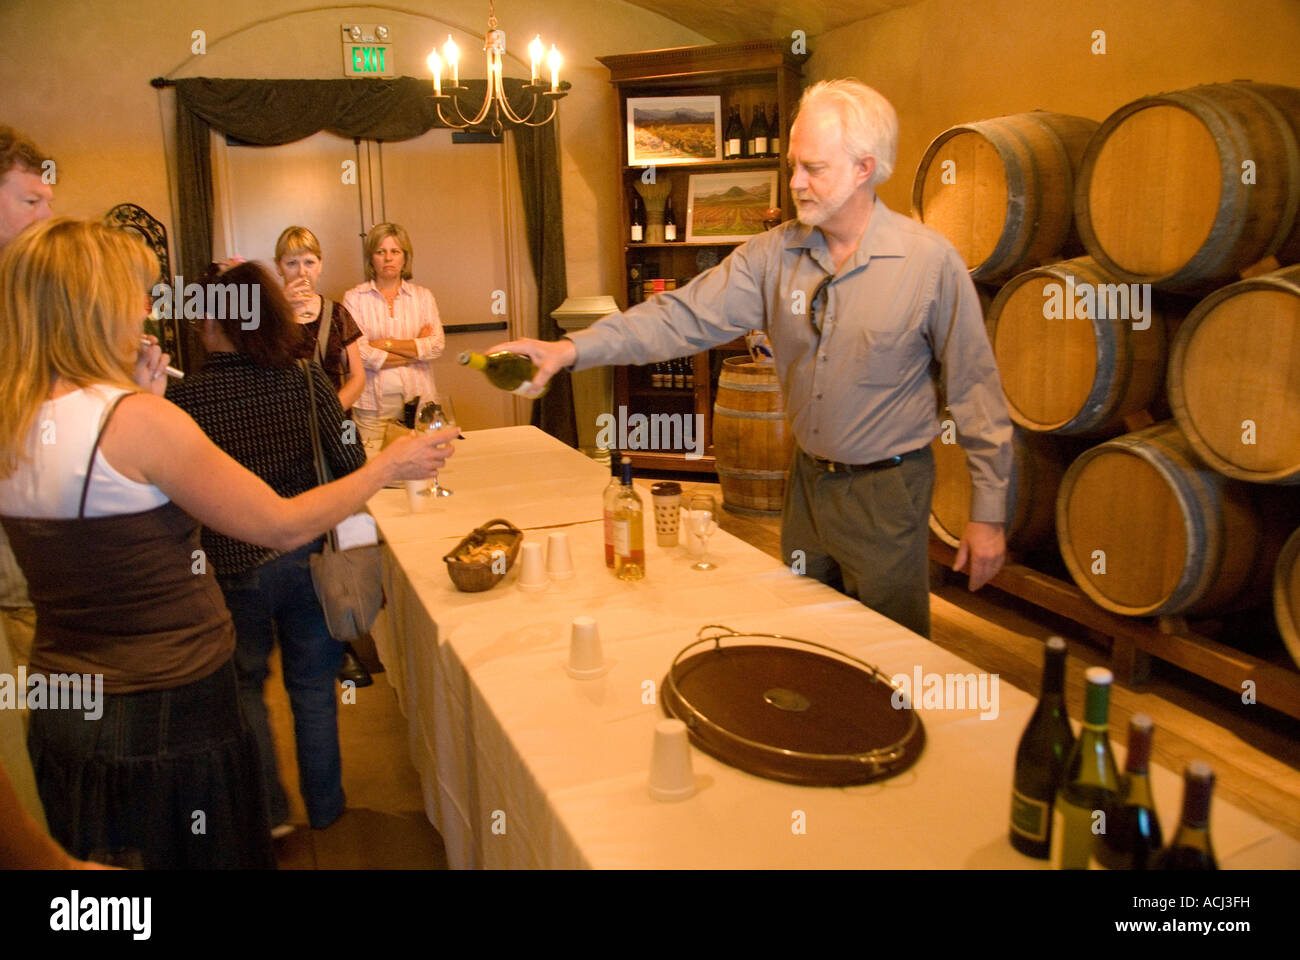 Winemaker Harry Hansen leads tasting at Edna Valley Vineyards near San Luis Obispo, California - Stock Image